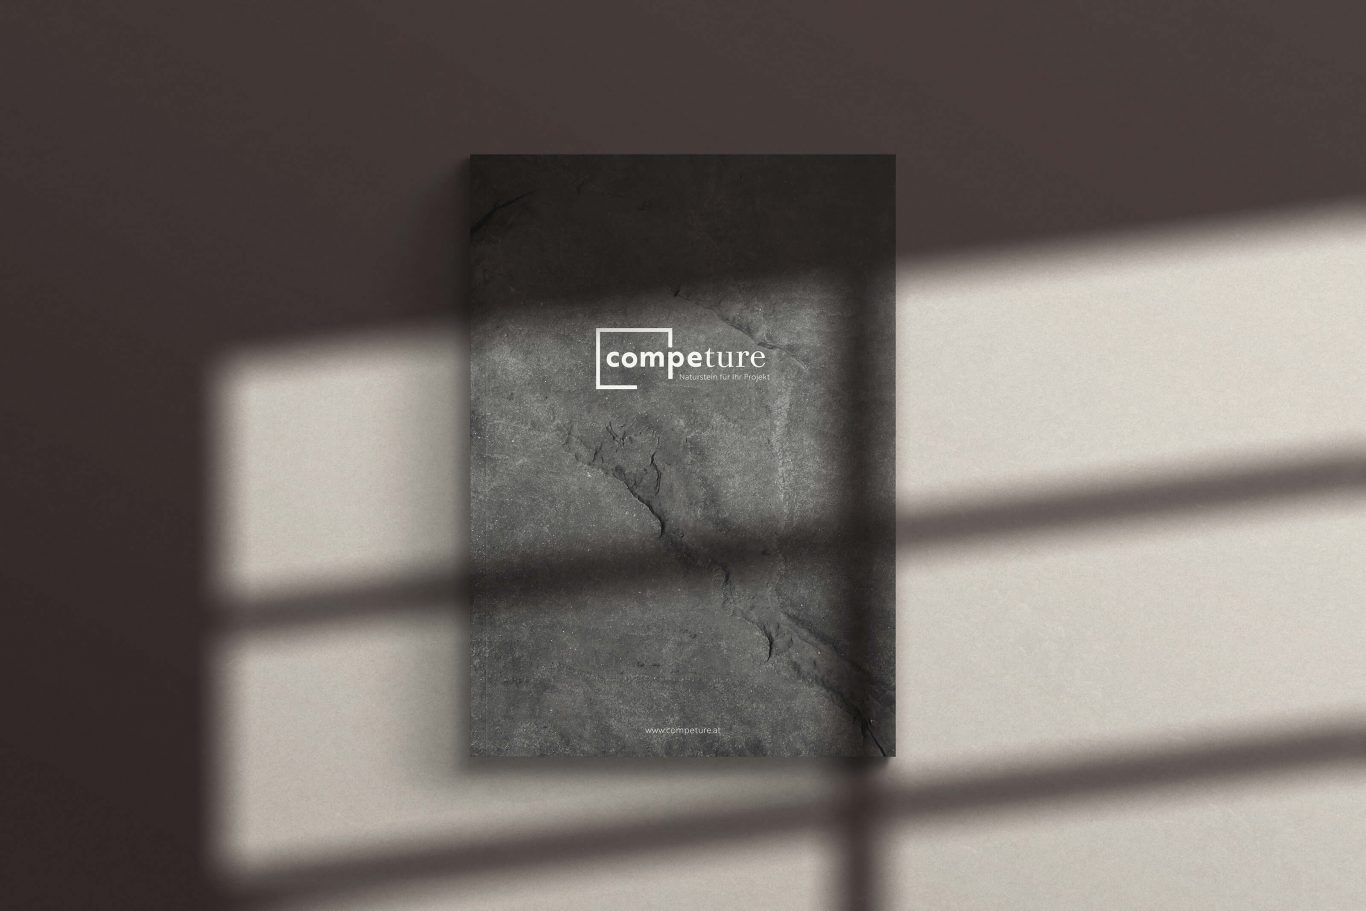 competure Produktfolder Titelseite